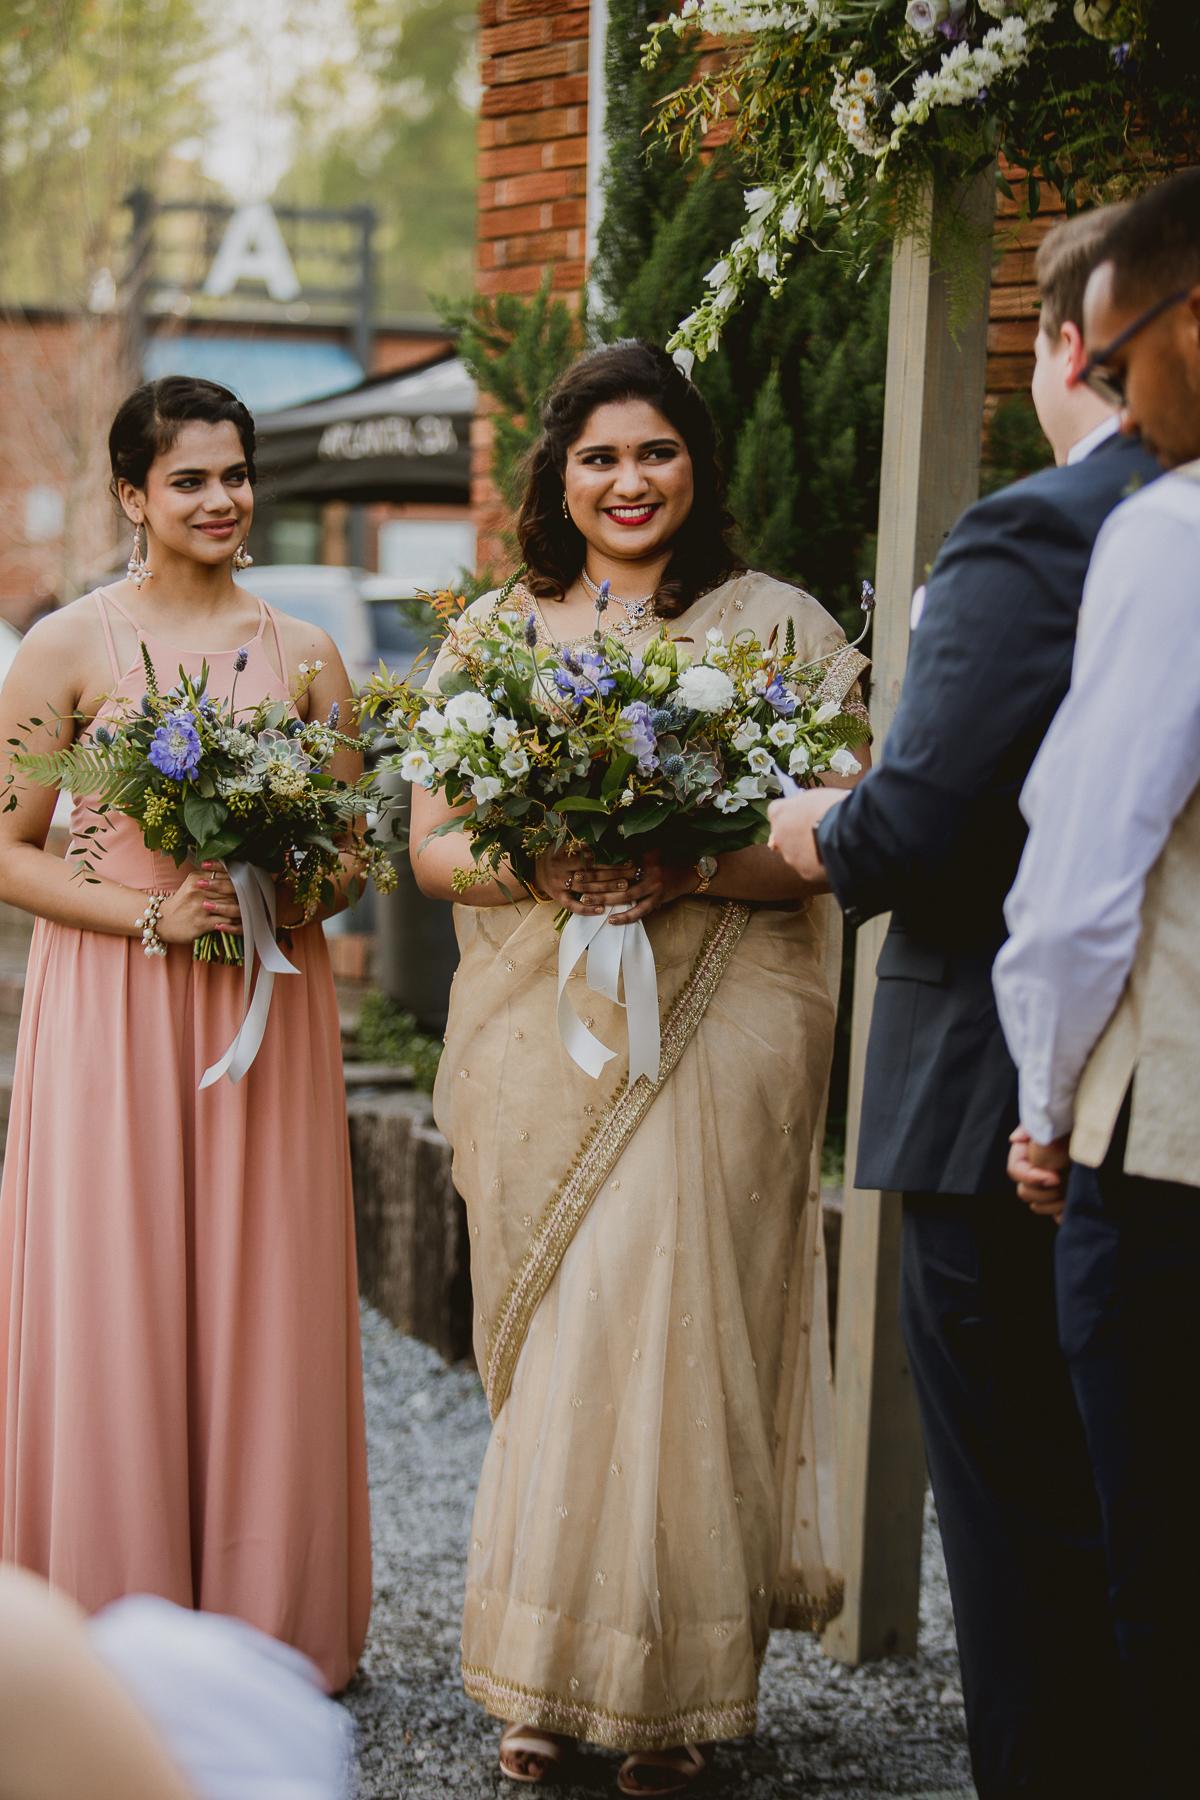 eventide-brewery-indian-american-fusion-kelley-raye-atlanta-los-angeles-wedding-photographer-63.jpg